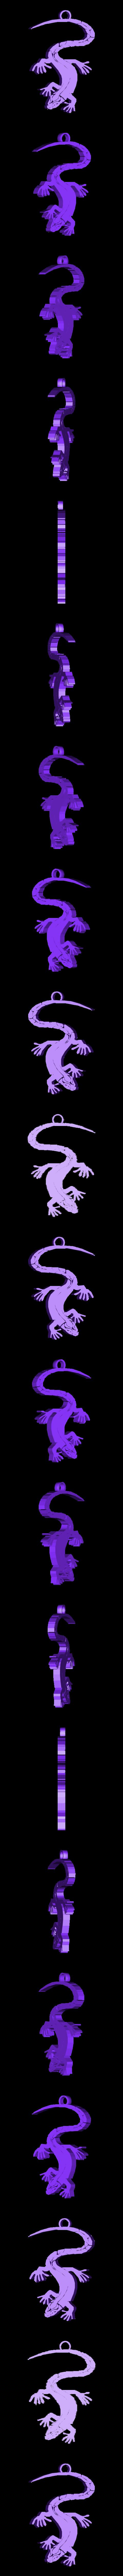 pendentif lézard 2.stl Download STL file Lizard pendant • 3D printing template, catf3d